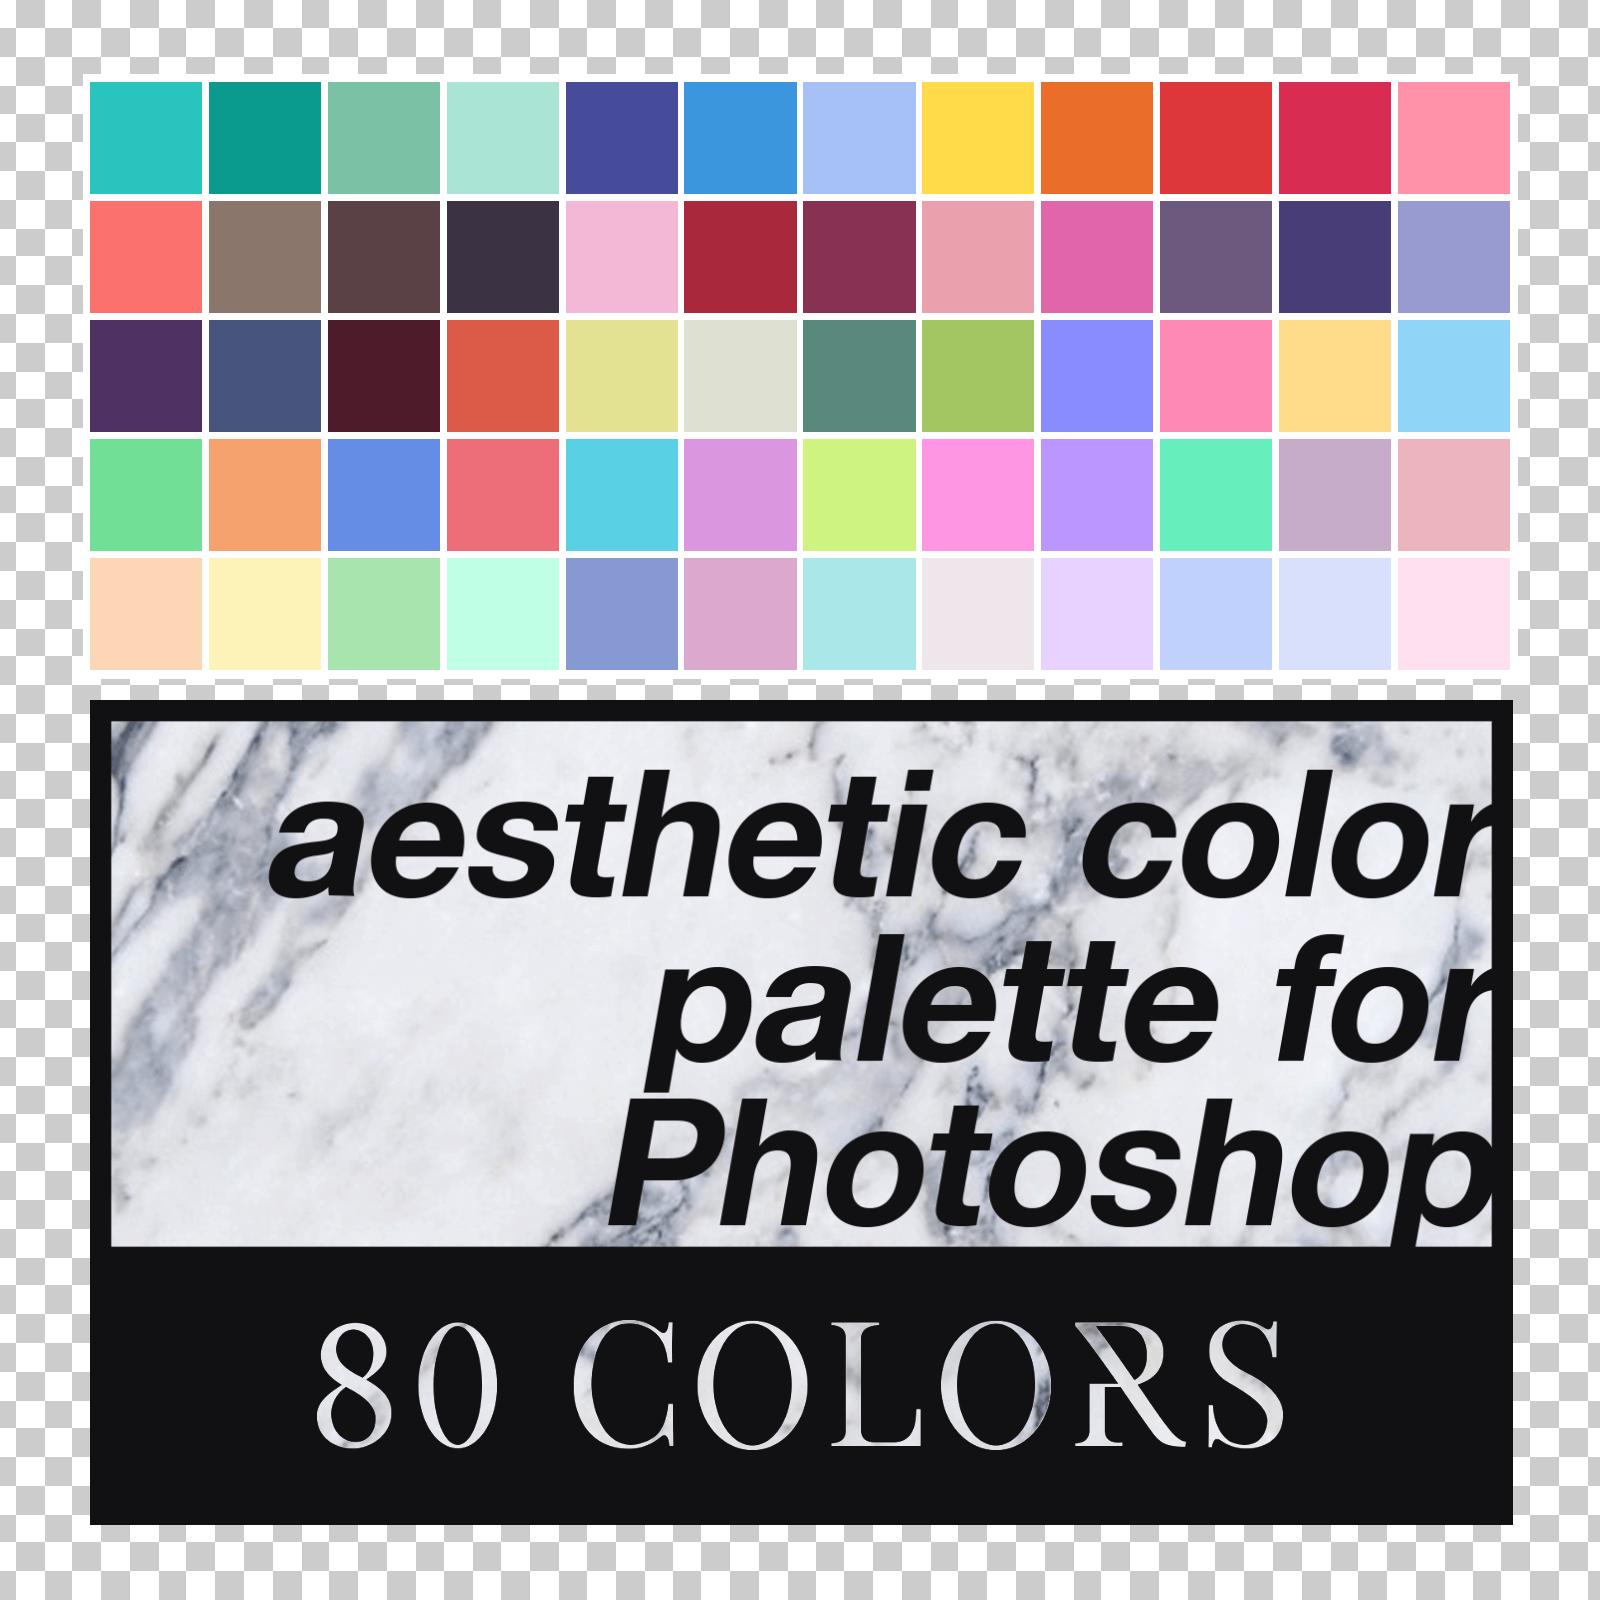 aesthetic color palette